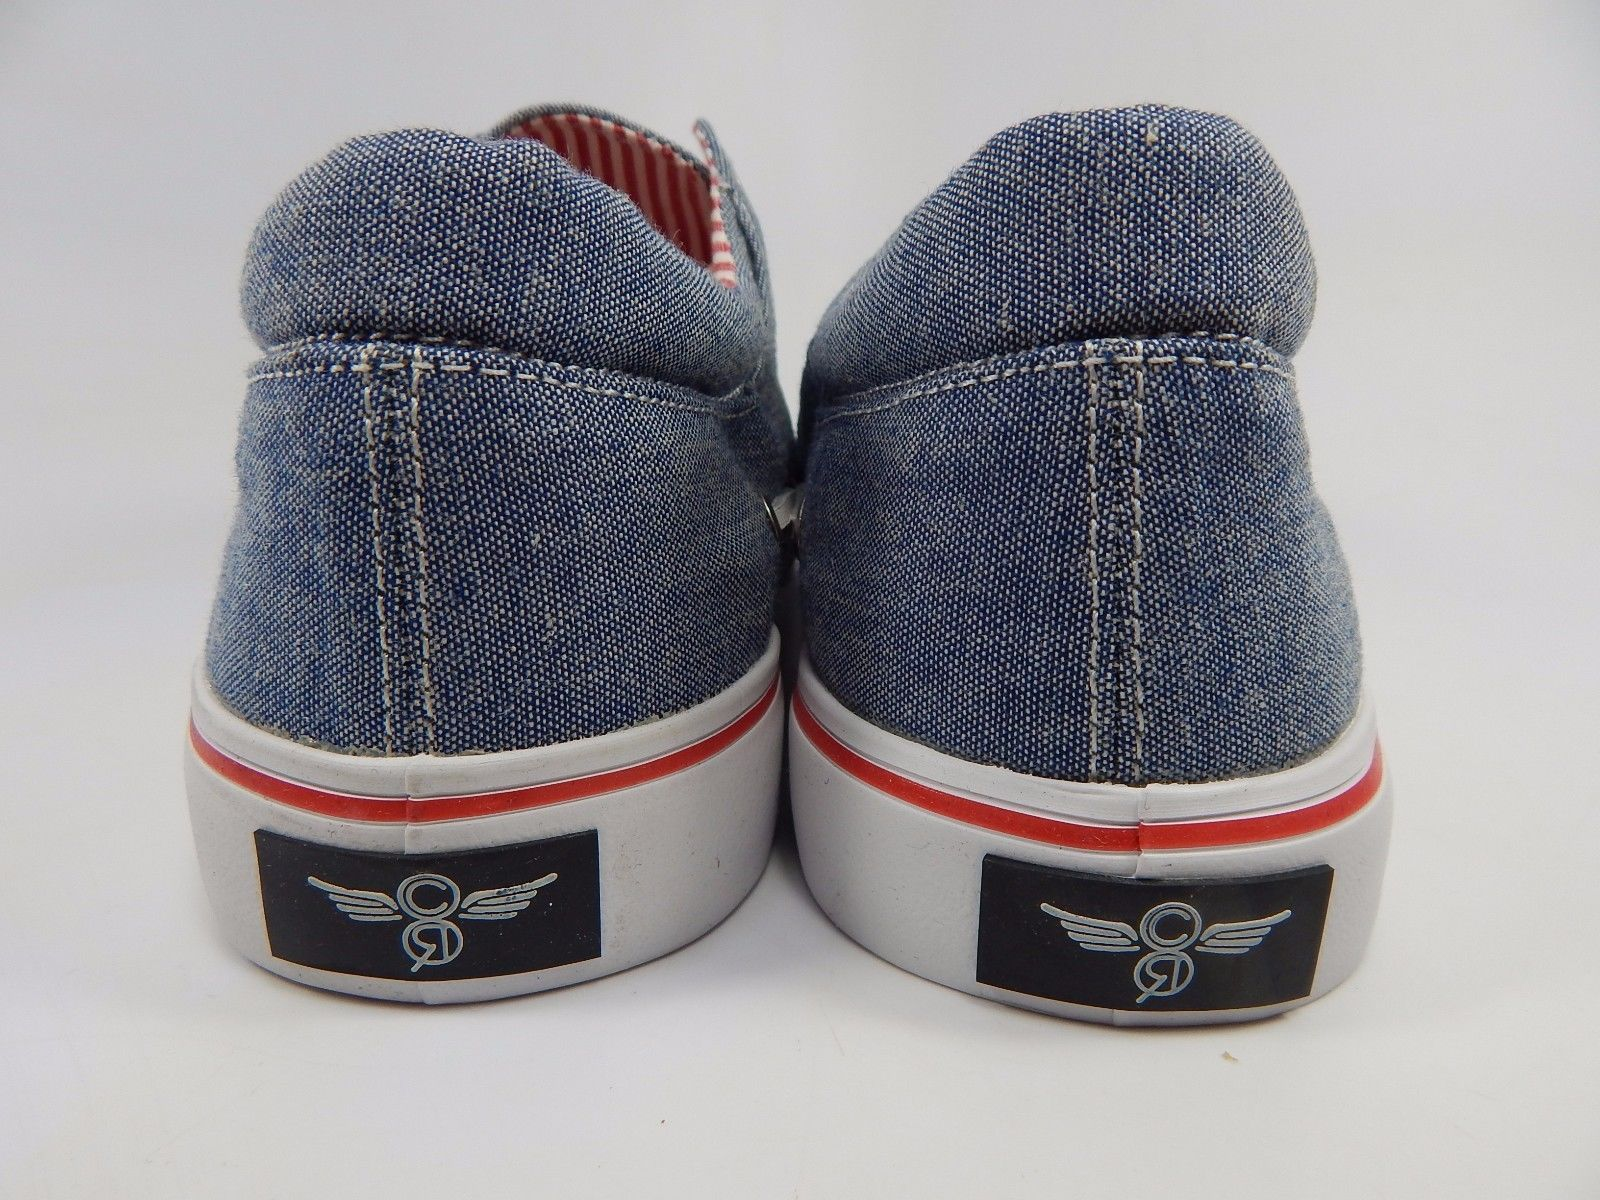 Creative Recreation Luchese Women's Fashion Sneaker Size US 7 M EU 38 WCR18811